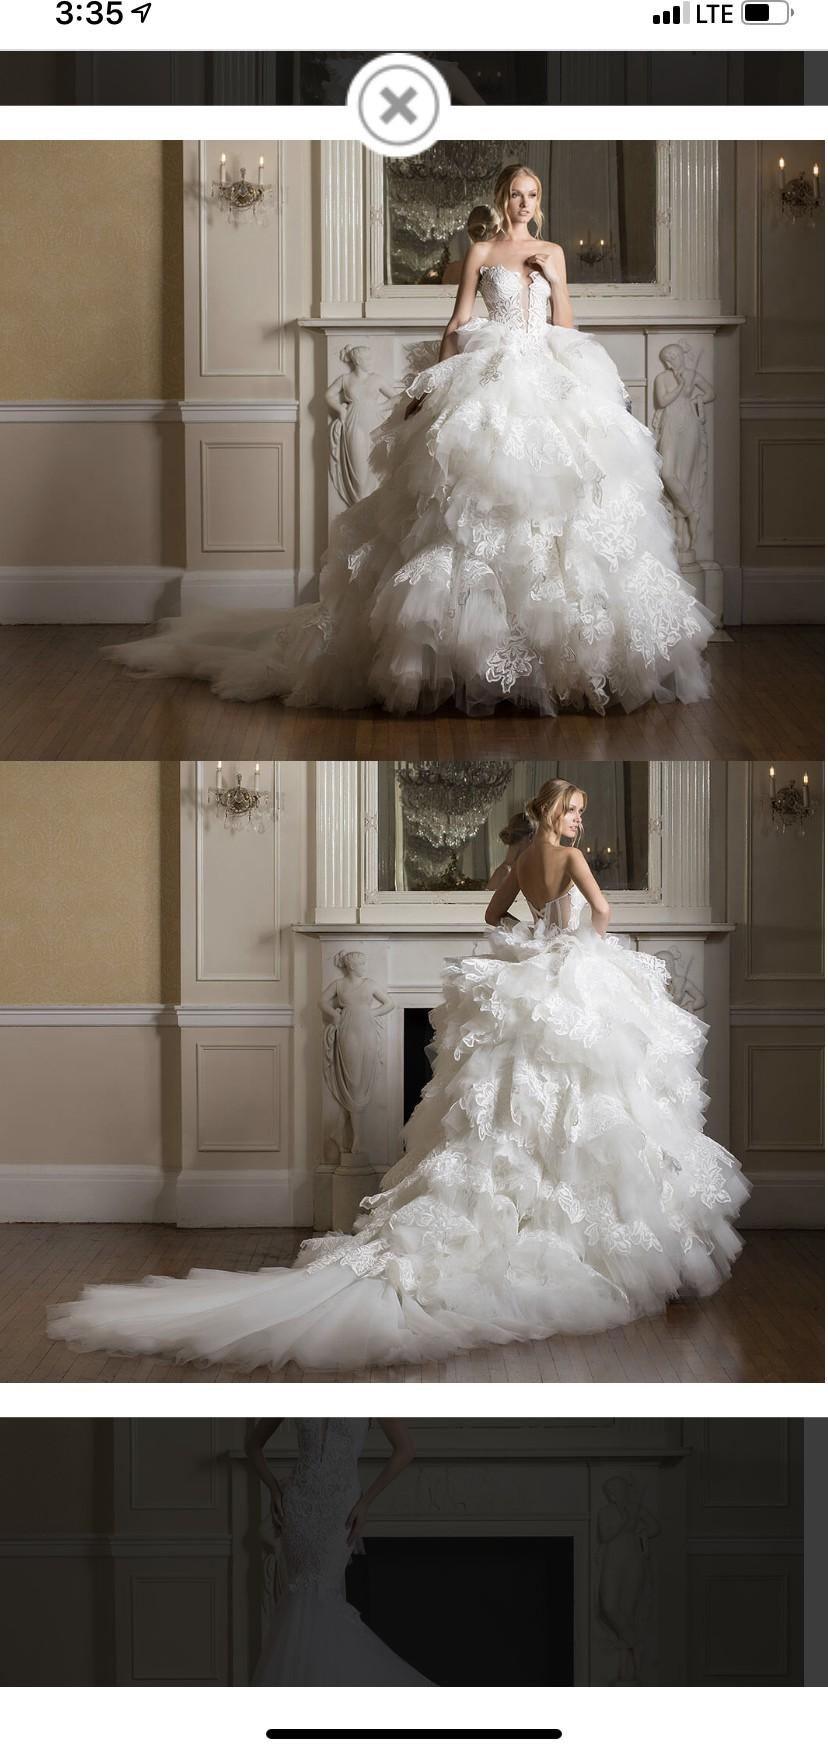 Pnina Tornai Dimensions 4531 Used Wedding Dress Save 75 Stillwhite,Short Summer Dresses For Weddings